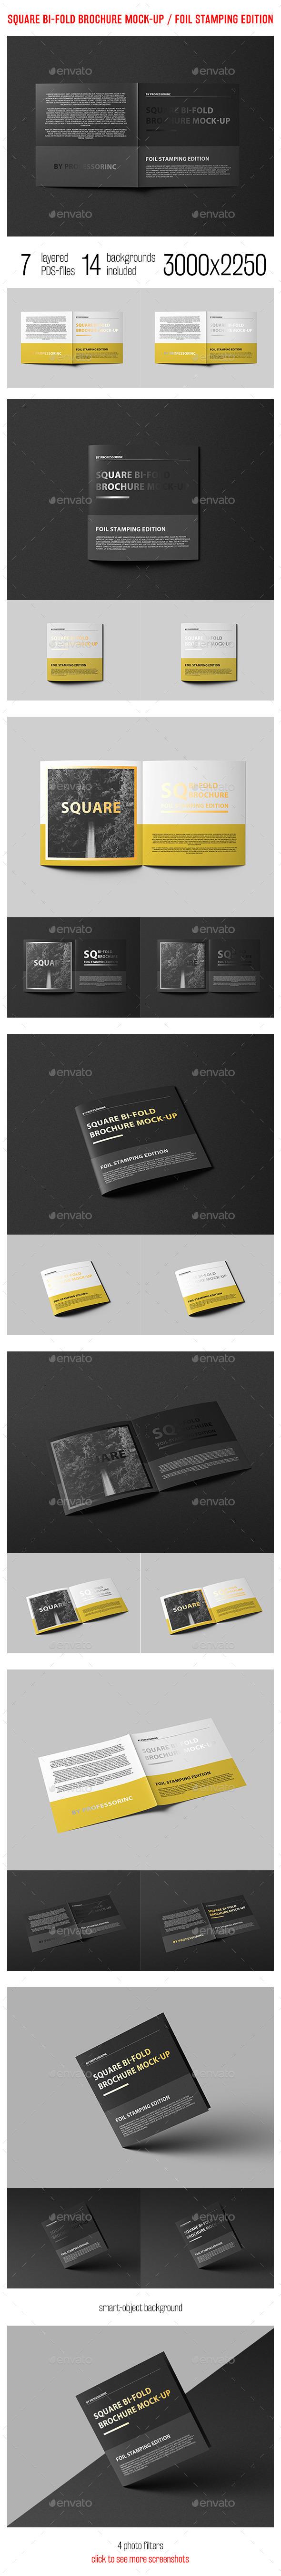 Square Bi-Fold Brochure Mock-up With Foil Stamping - Brochures Print